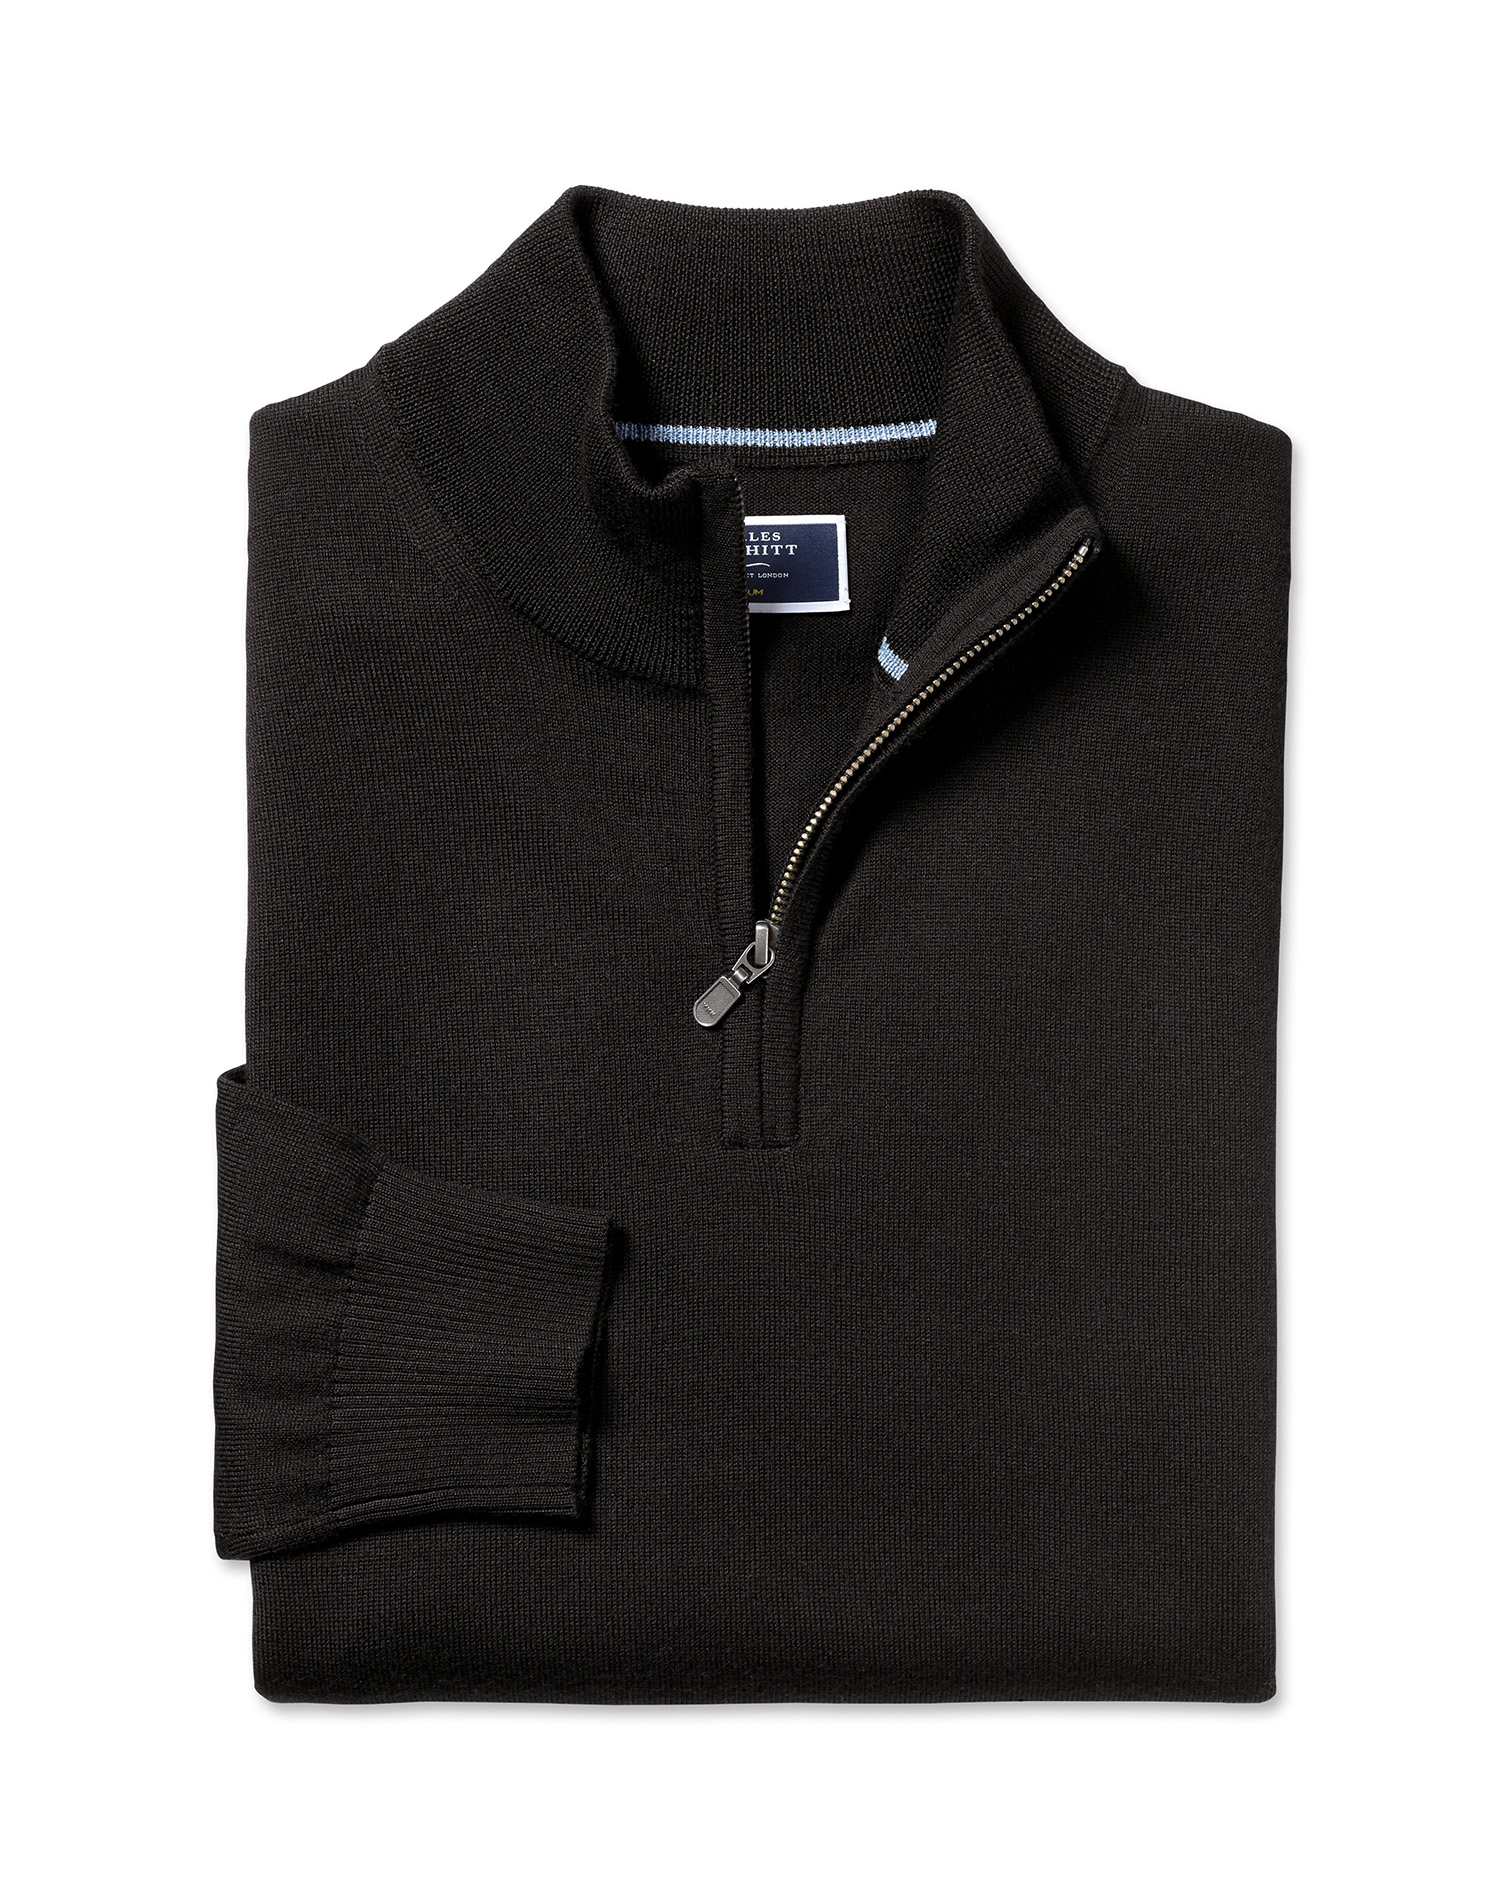 Black Merino Wool Zip Neck Jumper Size Large by Charles Tyrwhitt